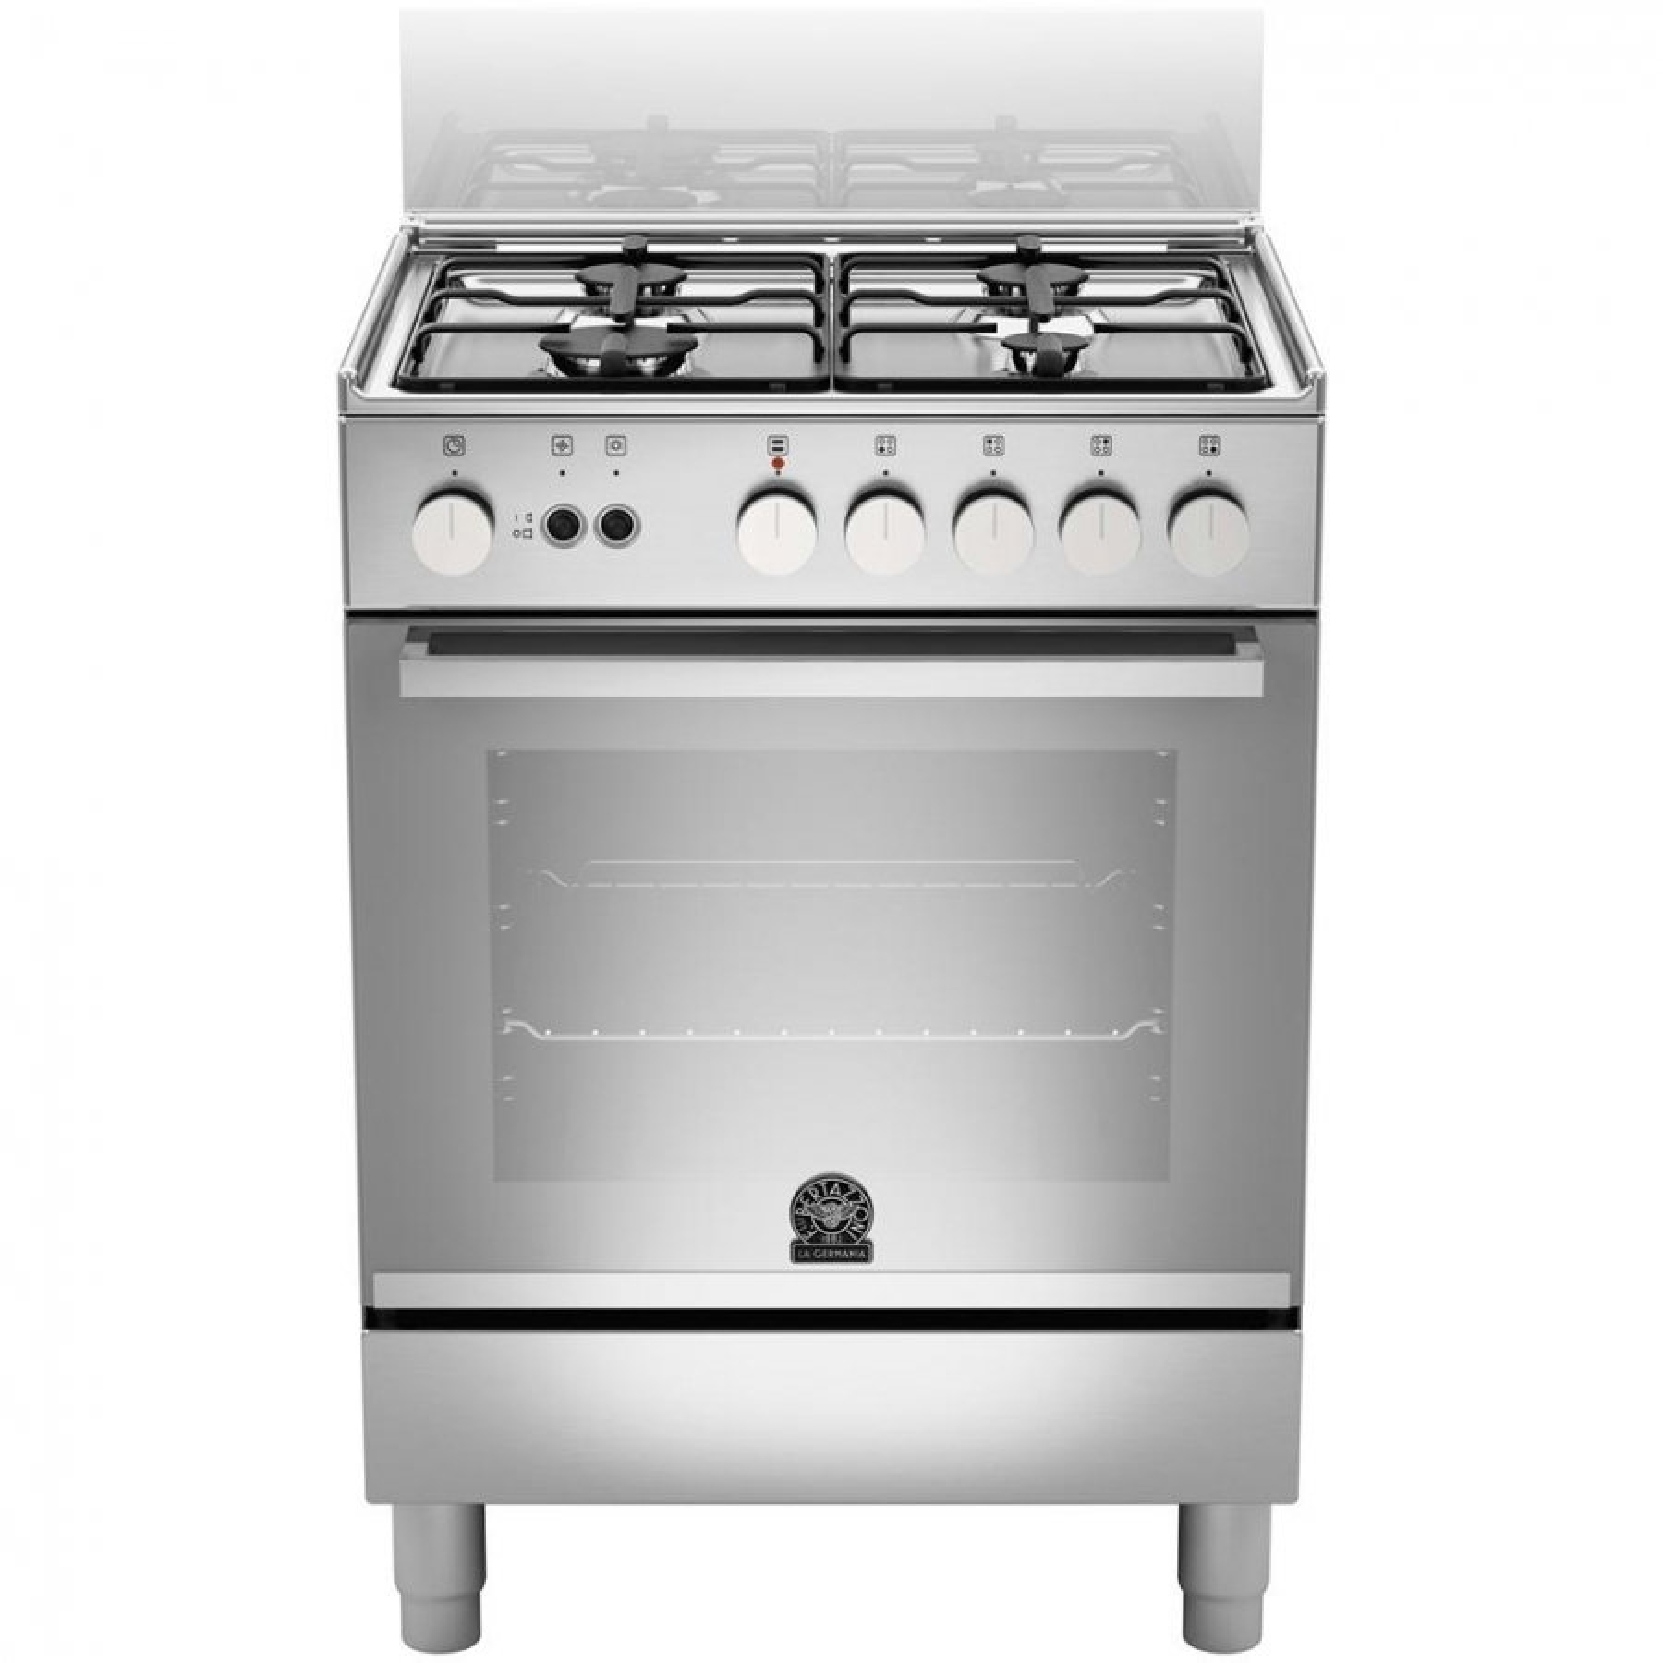 La germania cucina tu14071dx 4 fuochi a gas 60x50 inox - Cucine a gas ikea ...